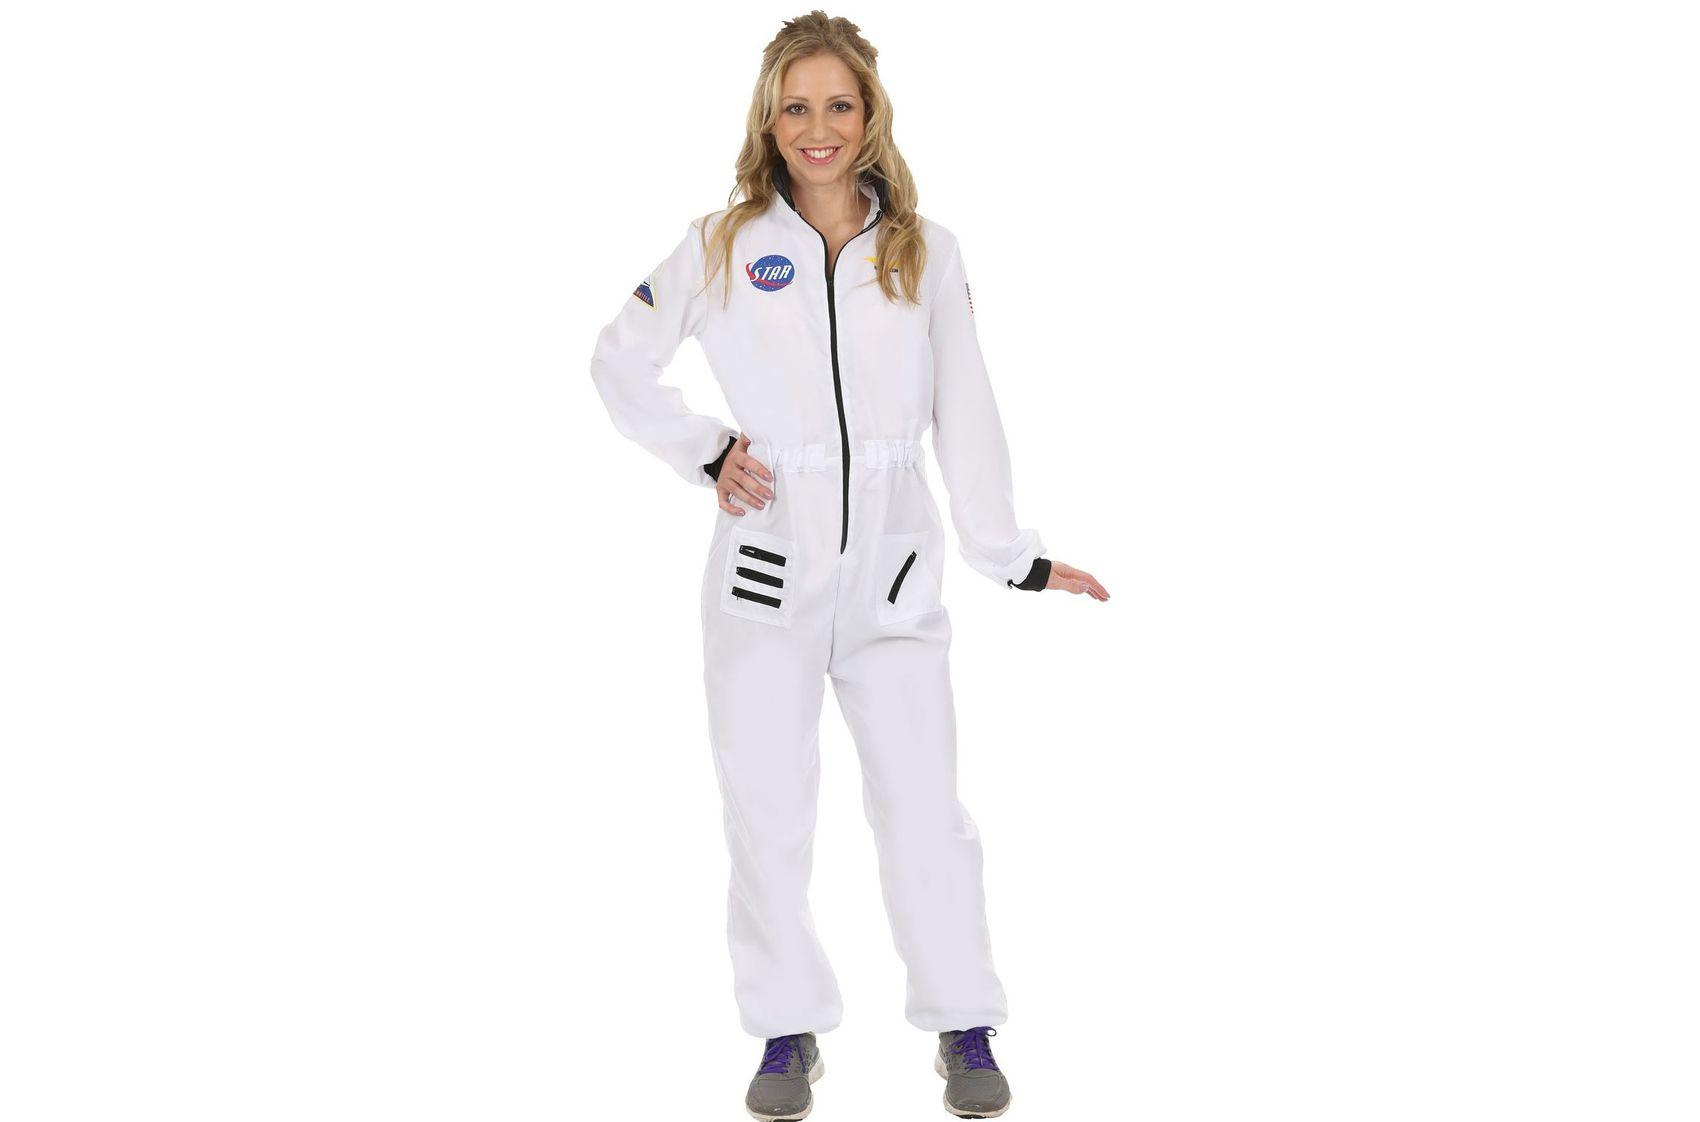 astronaut costume women - HD1700×1122